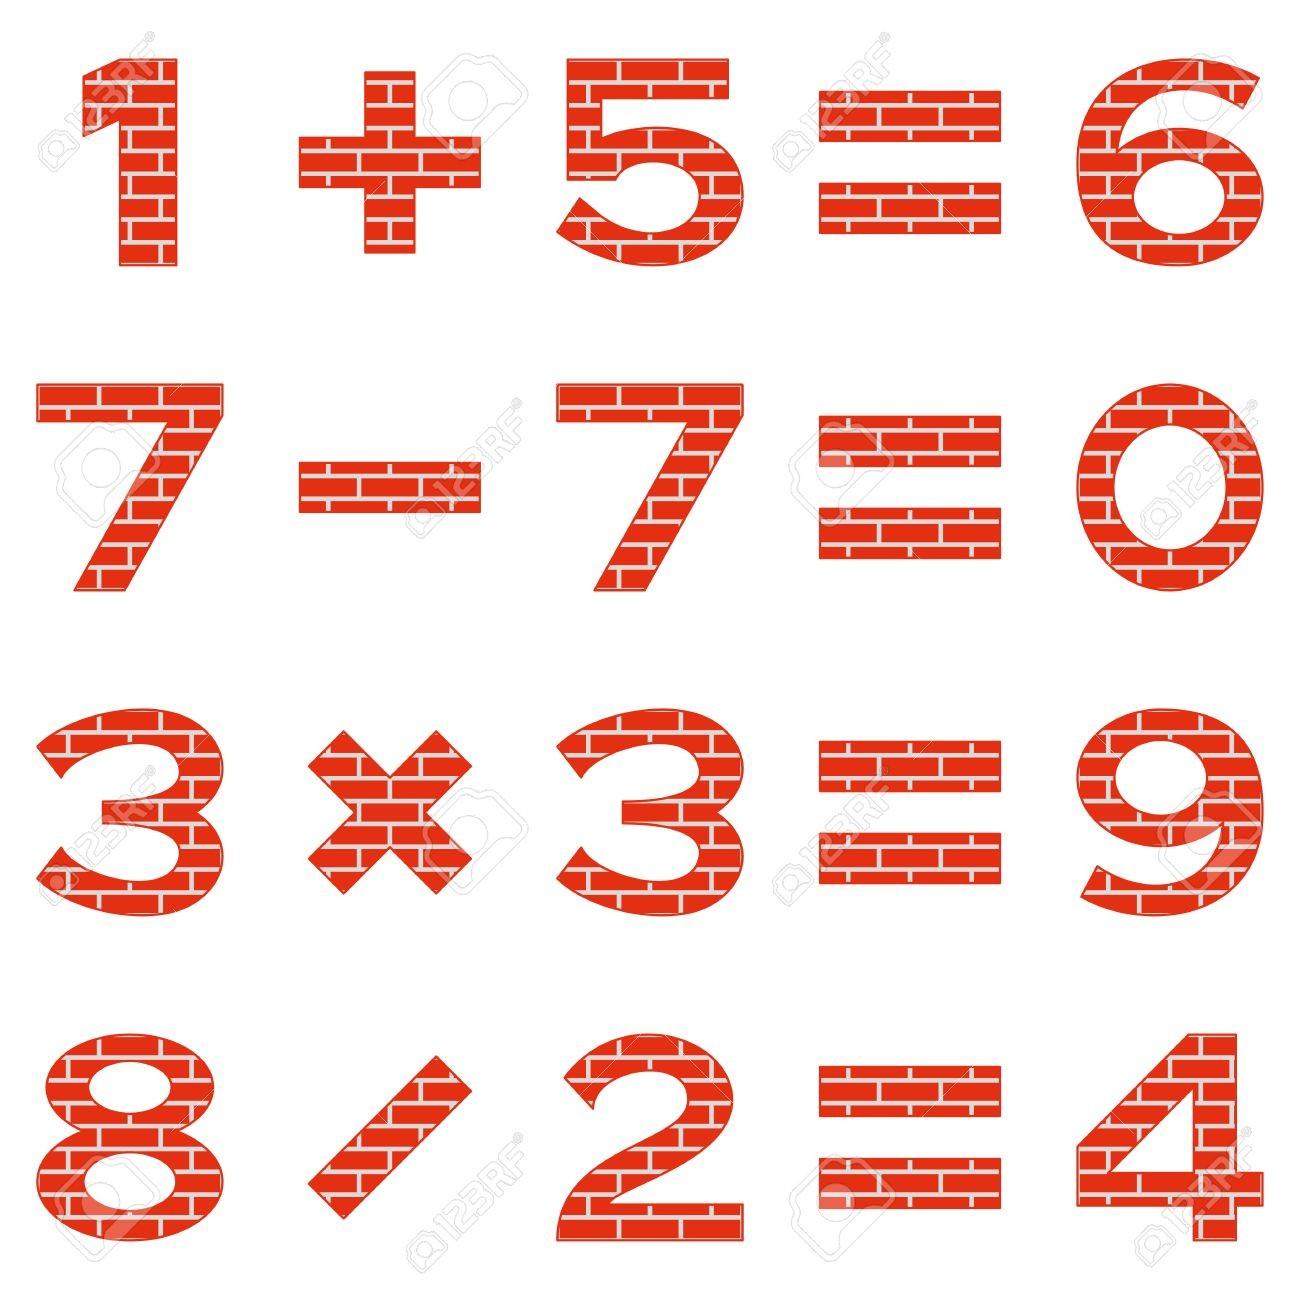 Calcul mental - calculatrice interdite